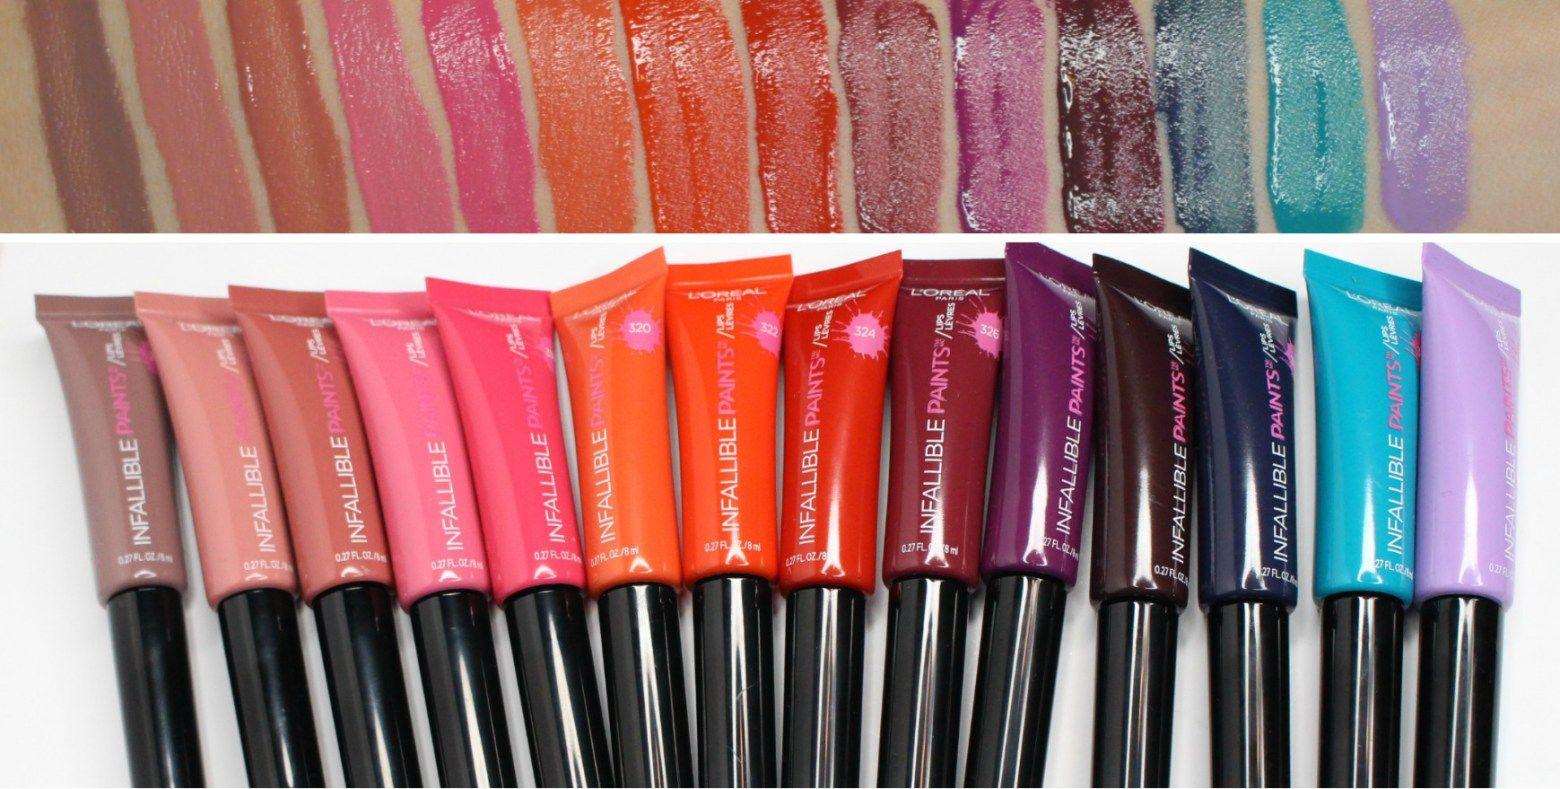 L'ORÉAL Infallible Lip Paints Review & Swatches!! (ALL